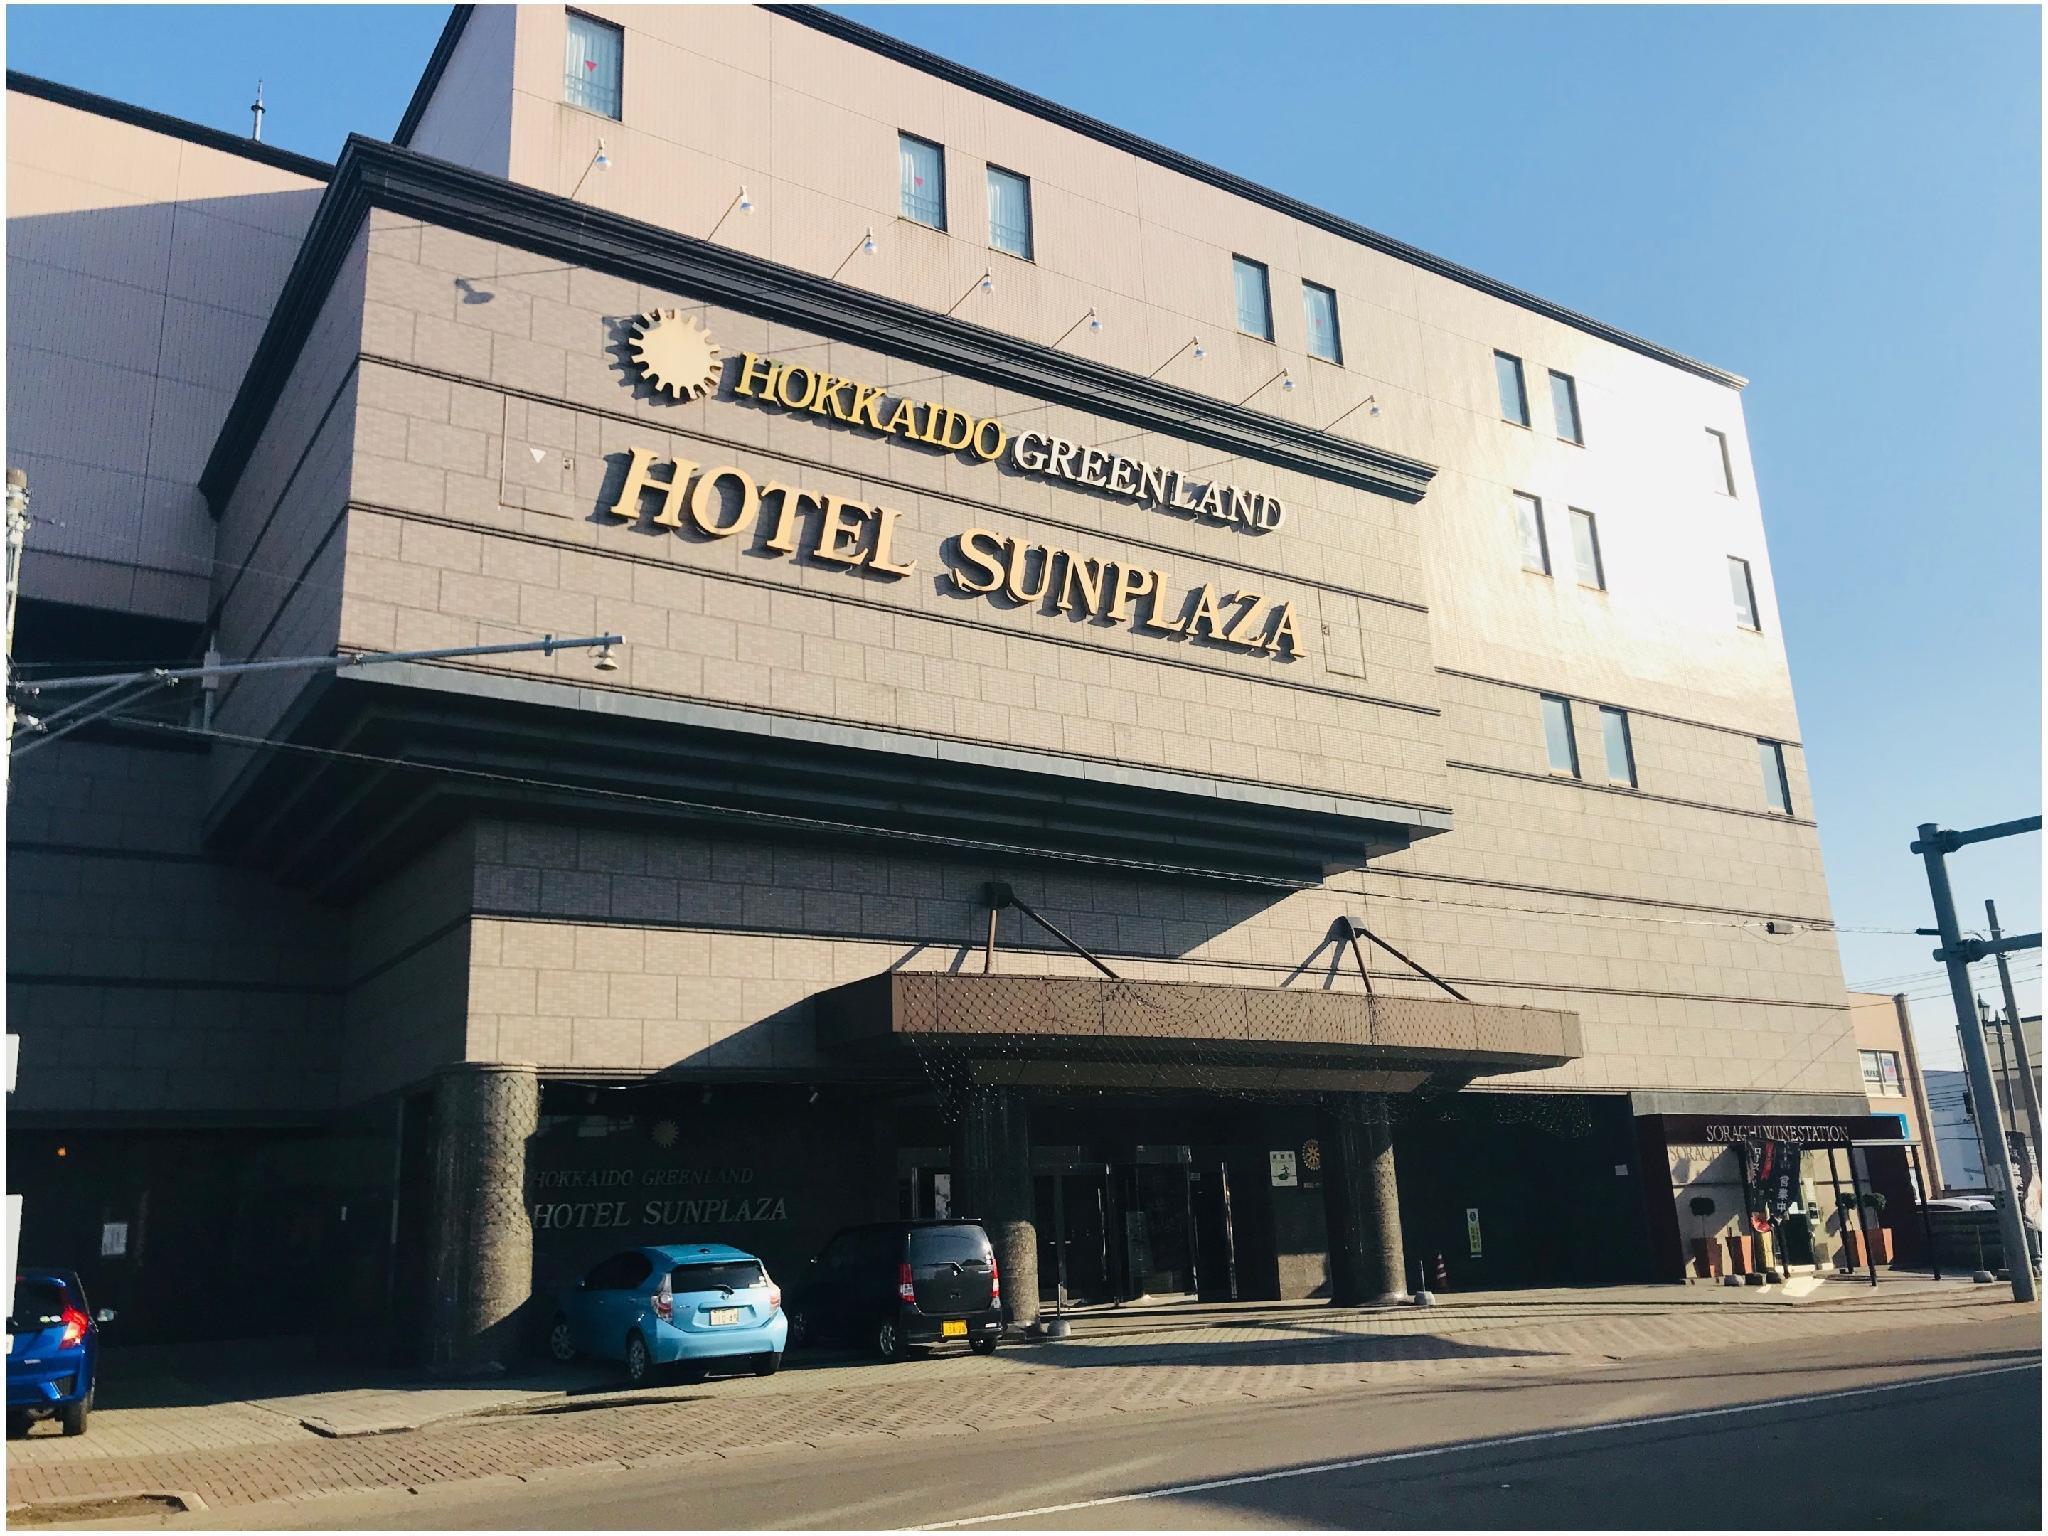 Hokkaido Greenland Hotel Sunplaza